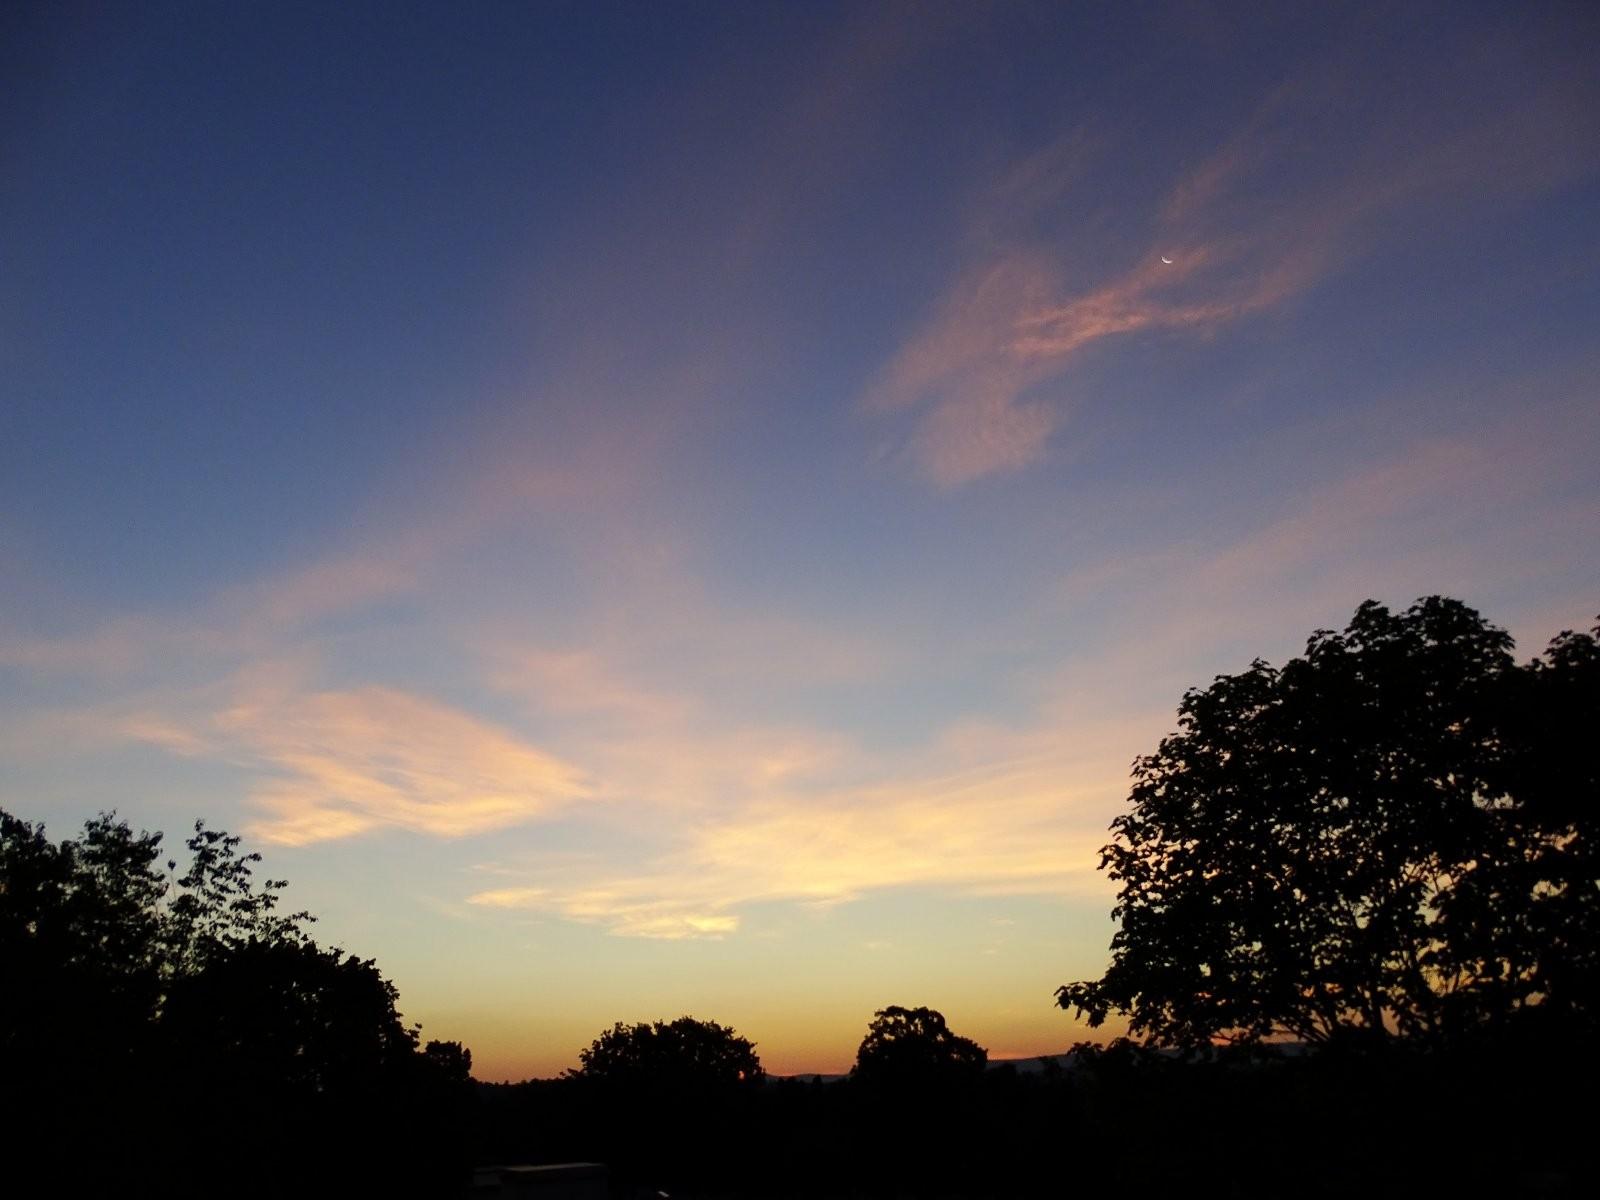 HX400V sunrise St Marys cemetery 023.JPG